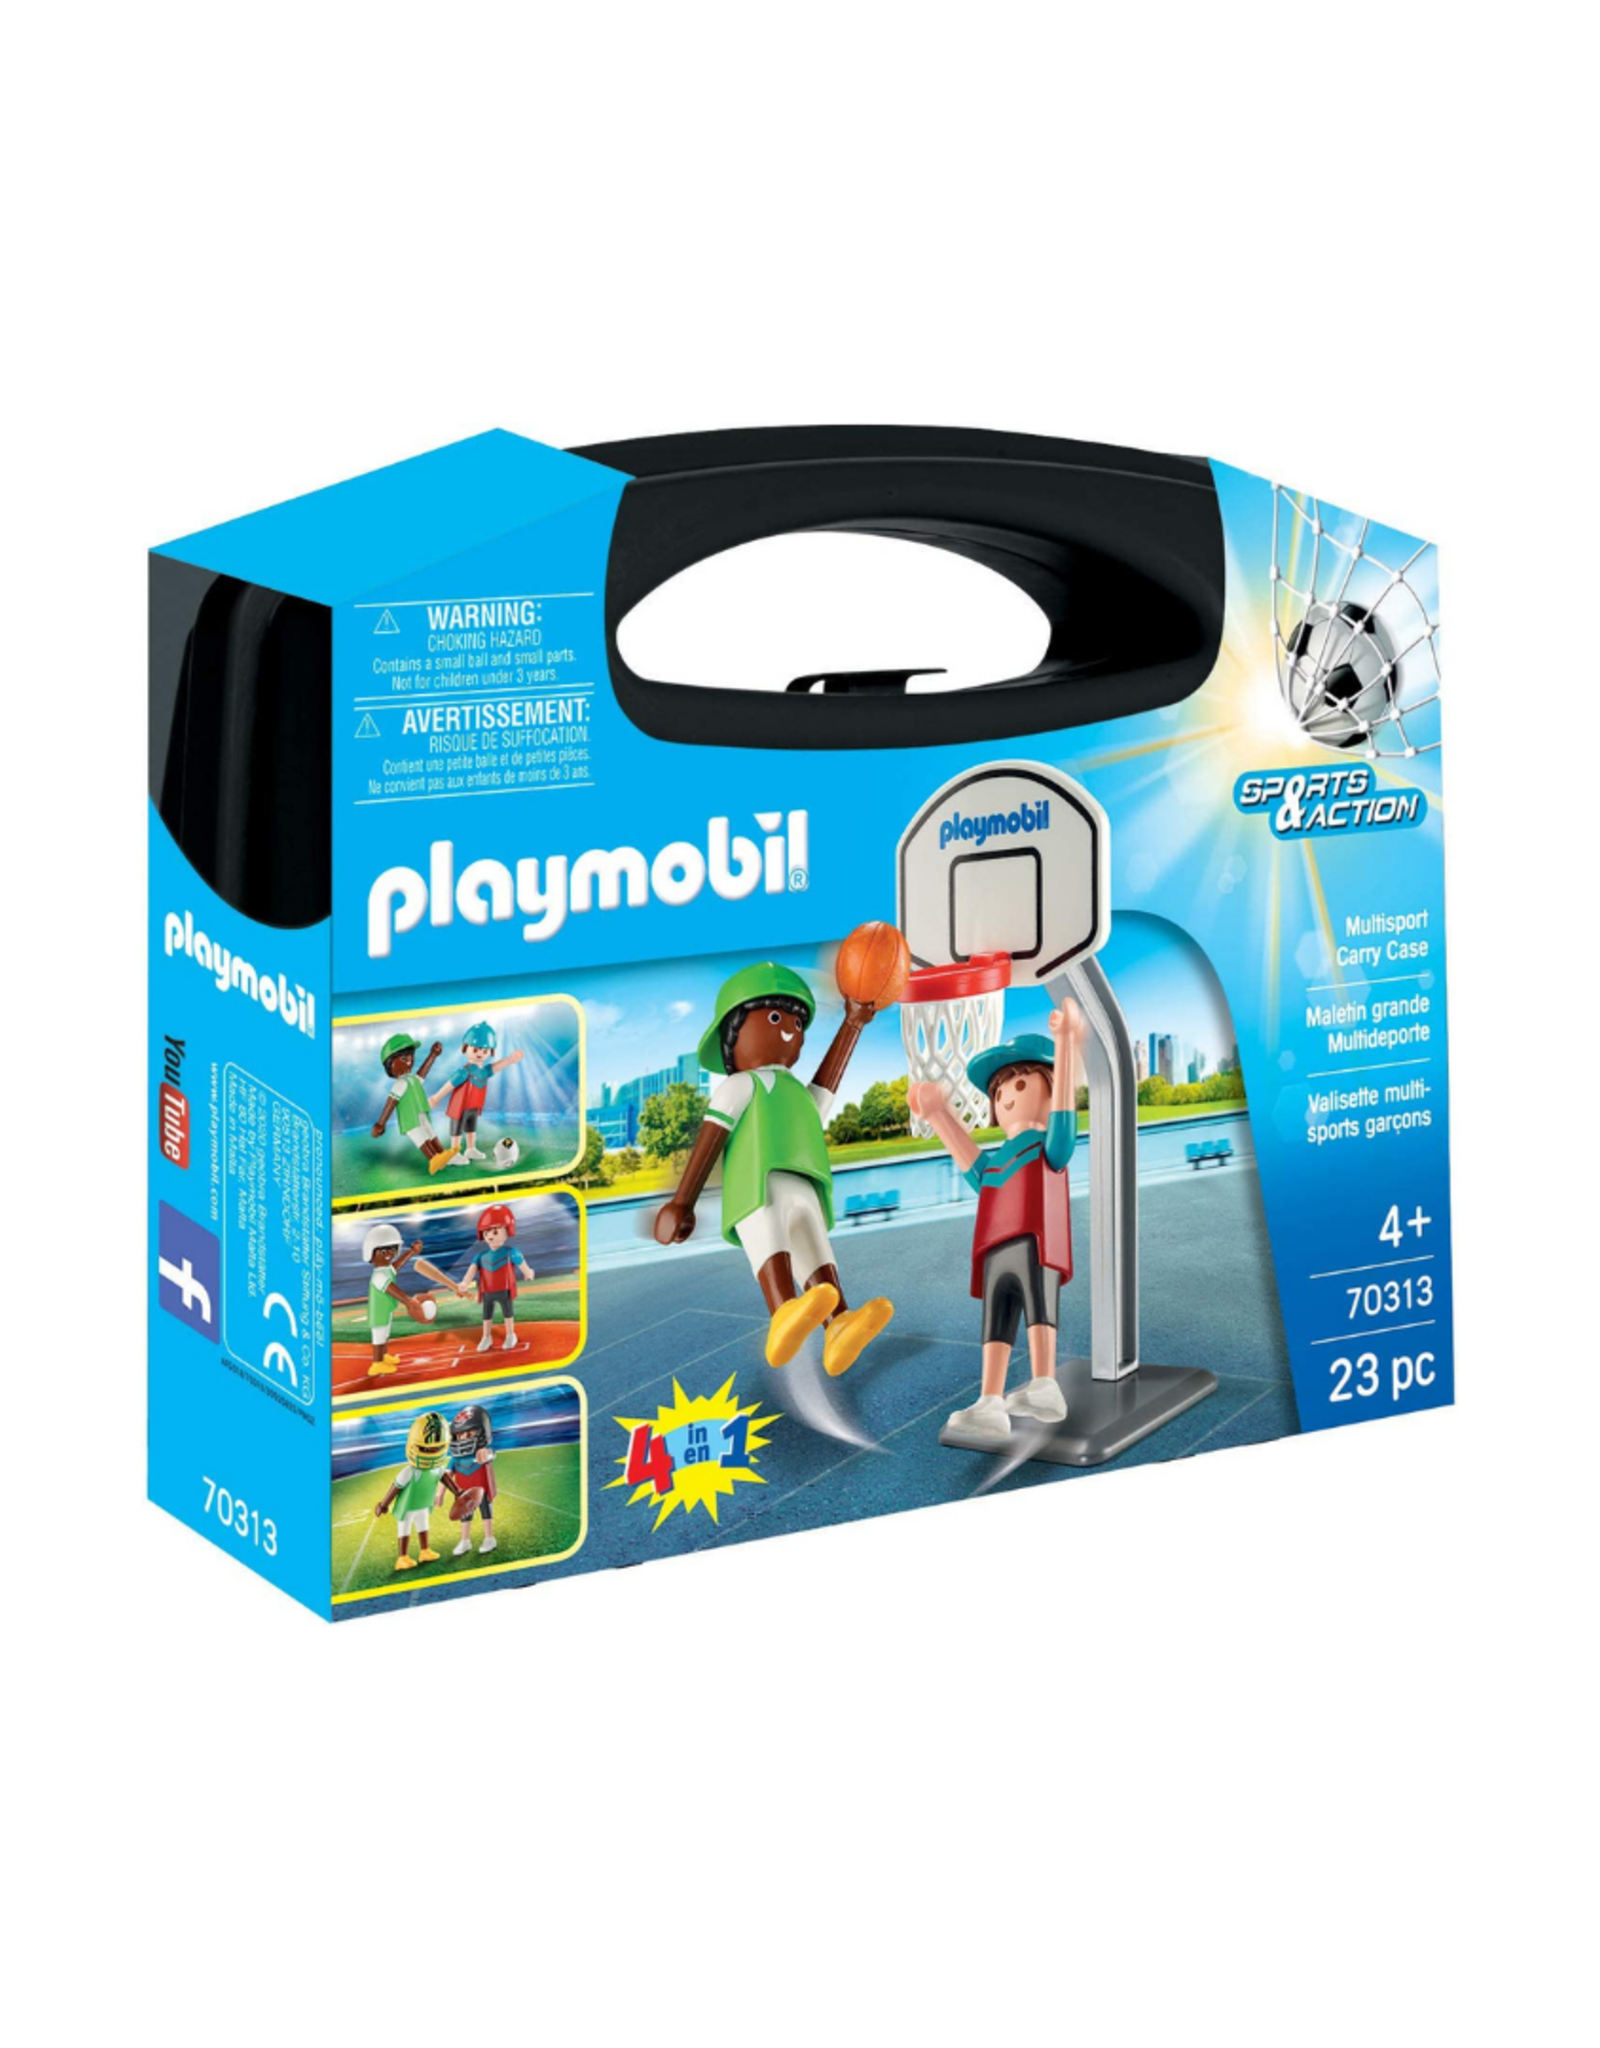 Playmobil PM - Multisport Carry Case